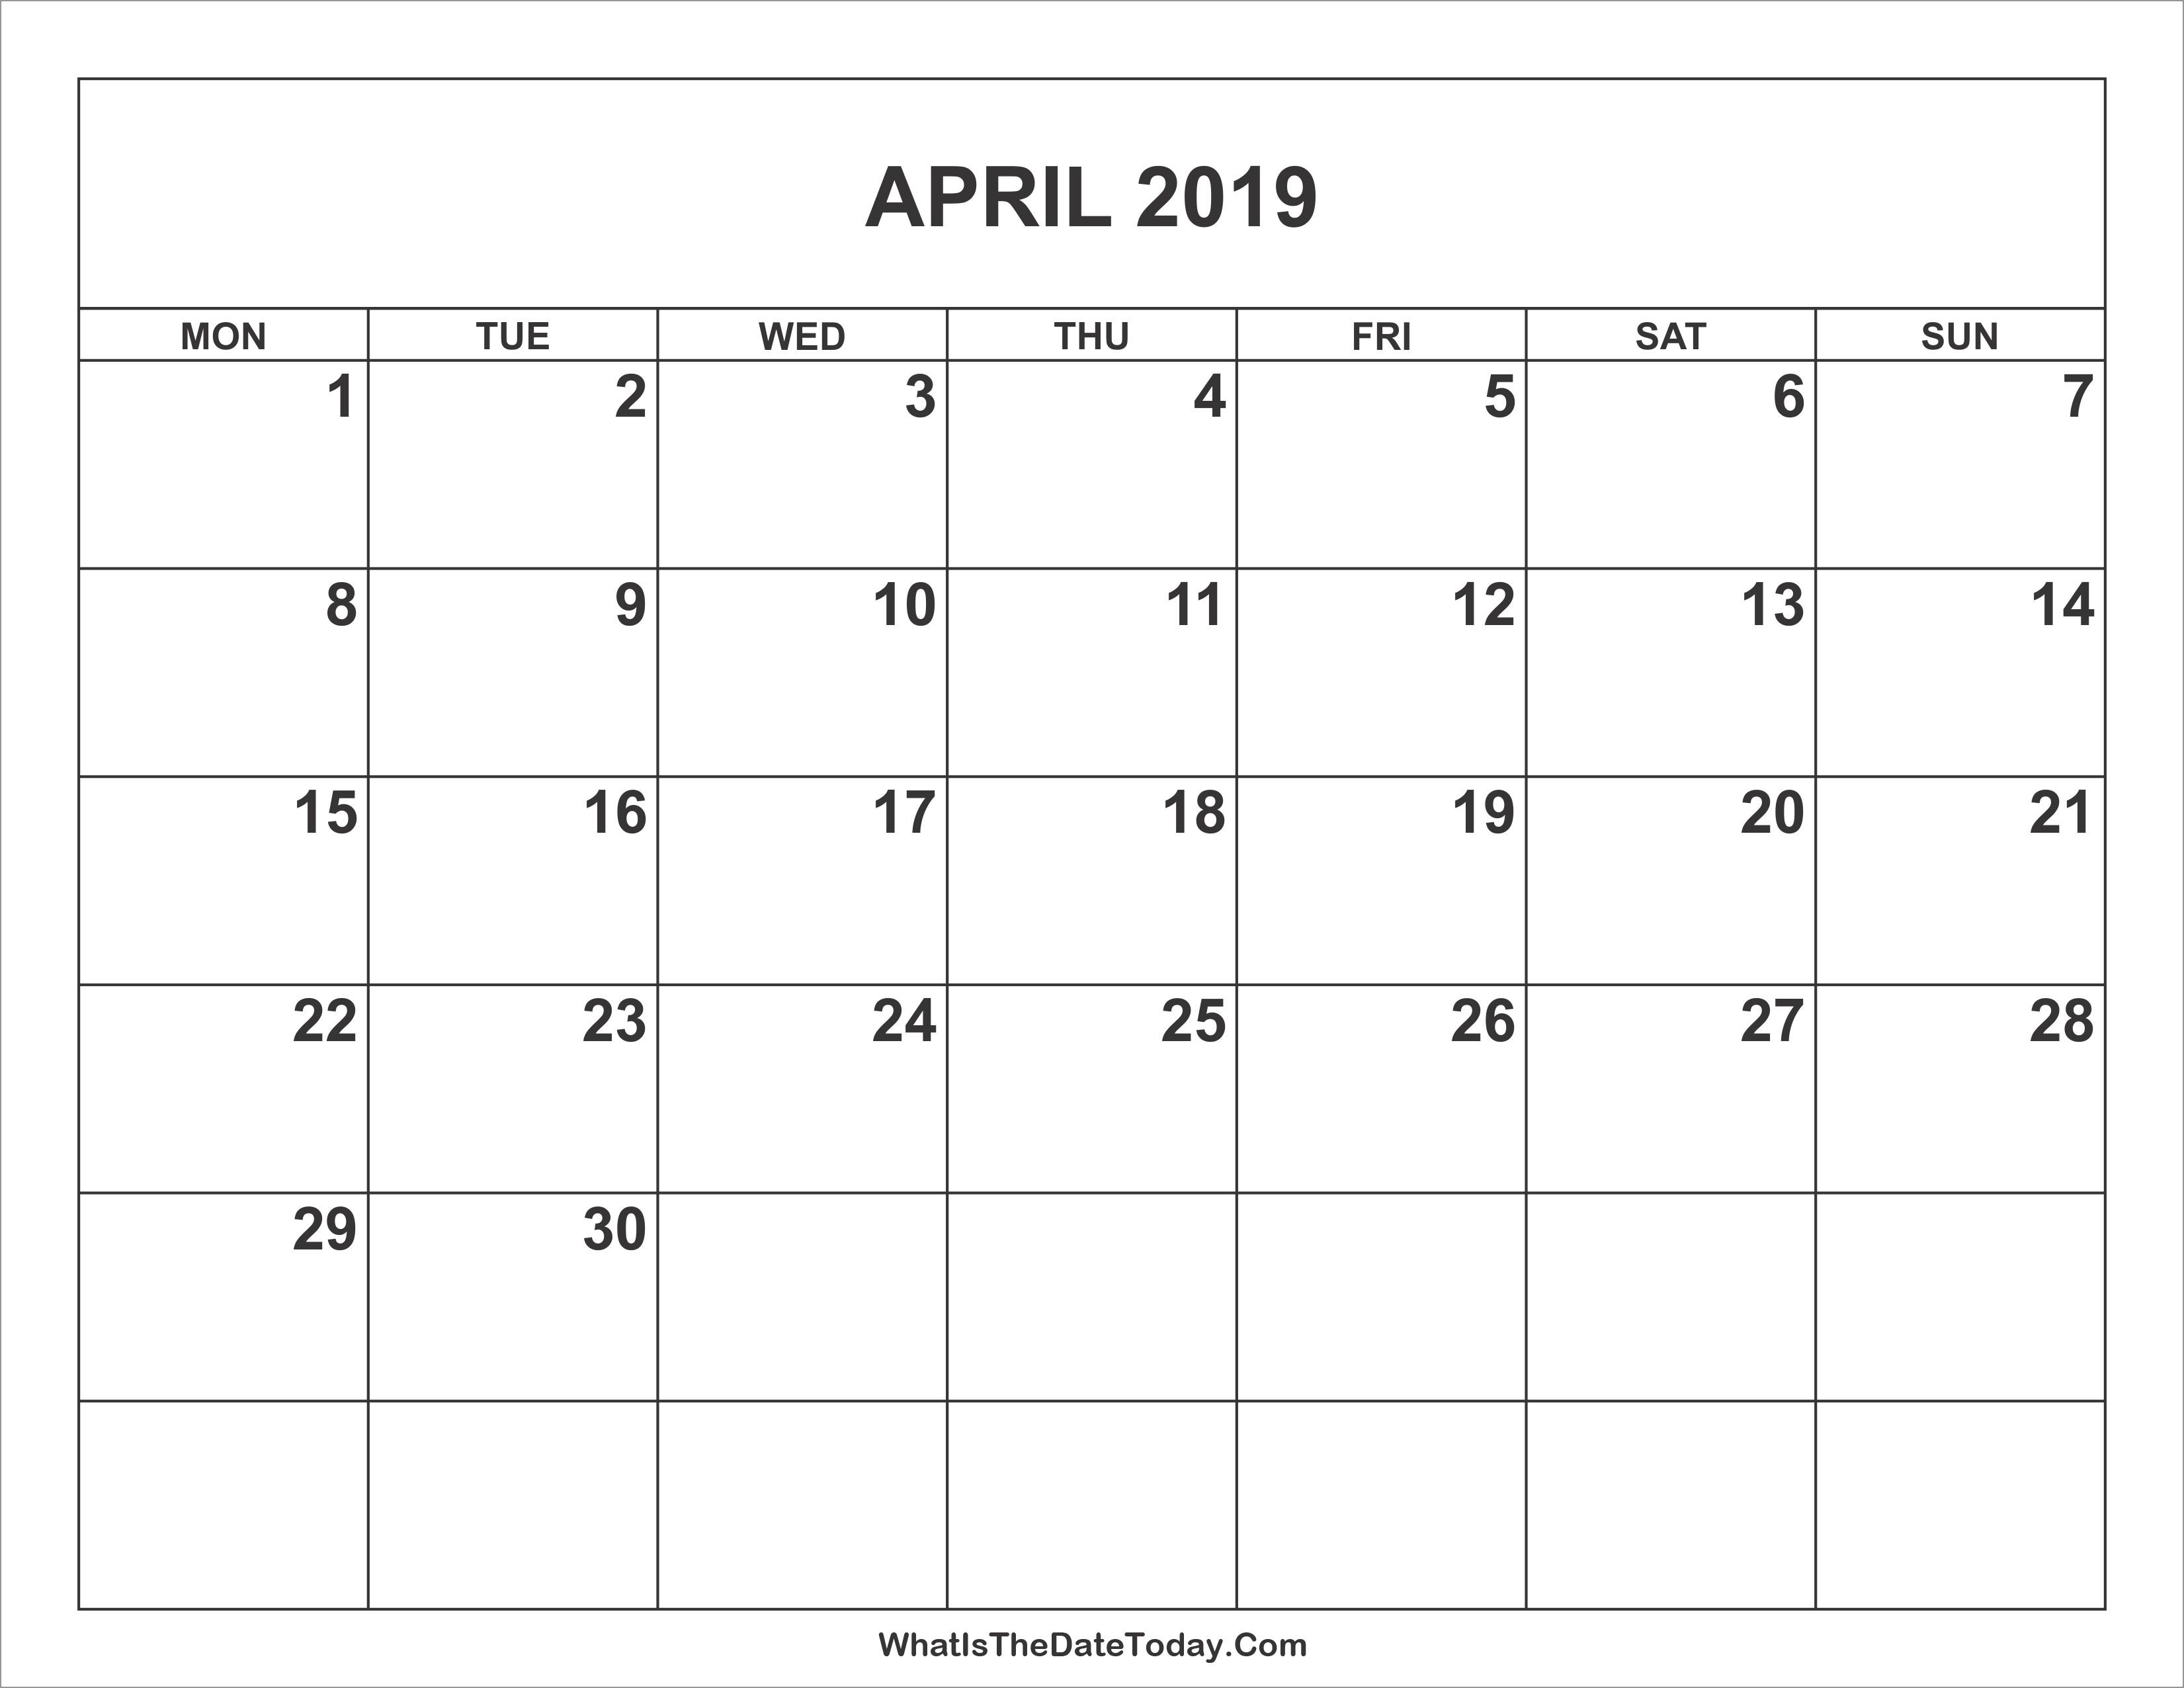 Calendar 2019 Usa Printable Recientes April 2019 Calendar Word April 2019 Calendar Of Calendar 2019 Usa Printable Más Actual Bill Payment Schedule Template Best Fiscal Calendars 2019 as Free